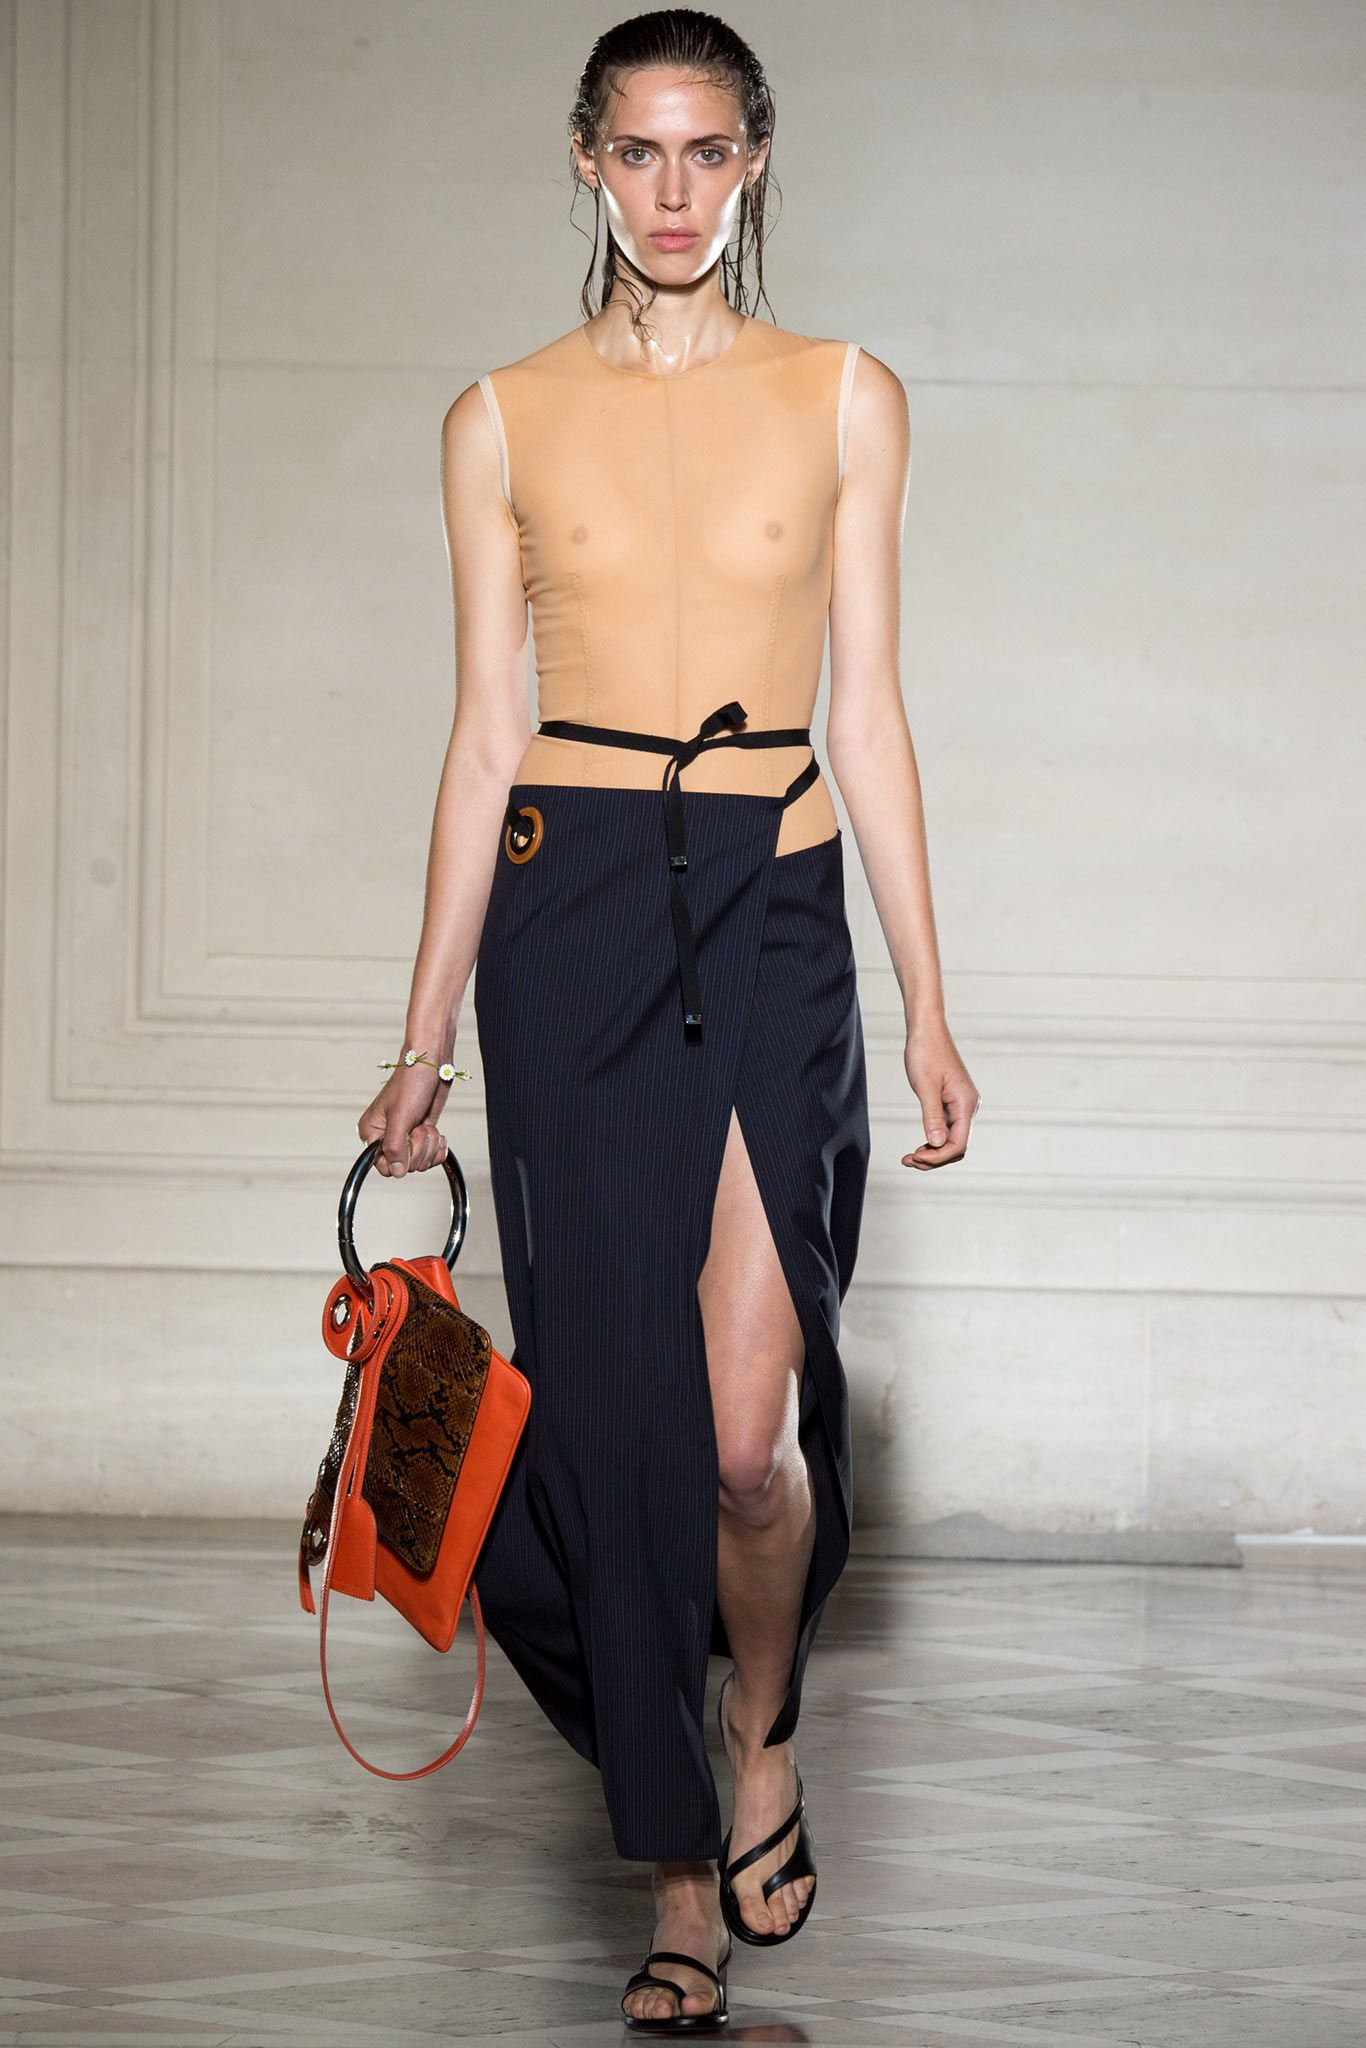 11 best Georgia hilmer fashion week